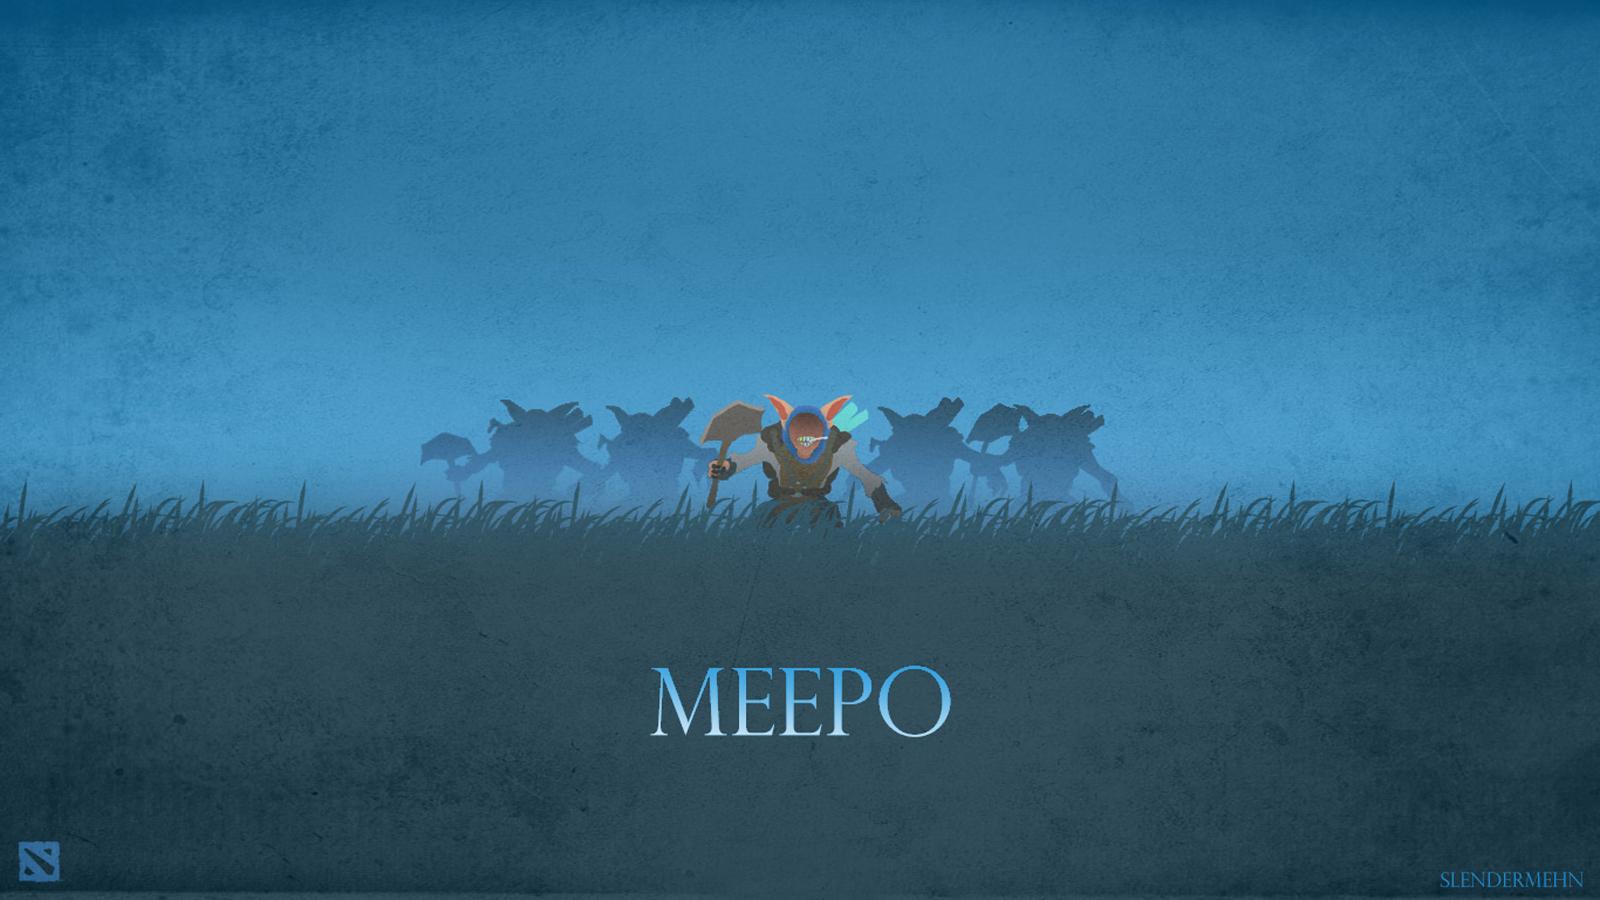 meepo dota 2 wallpaper 1600x900jpg 1600x900